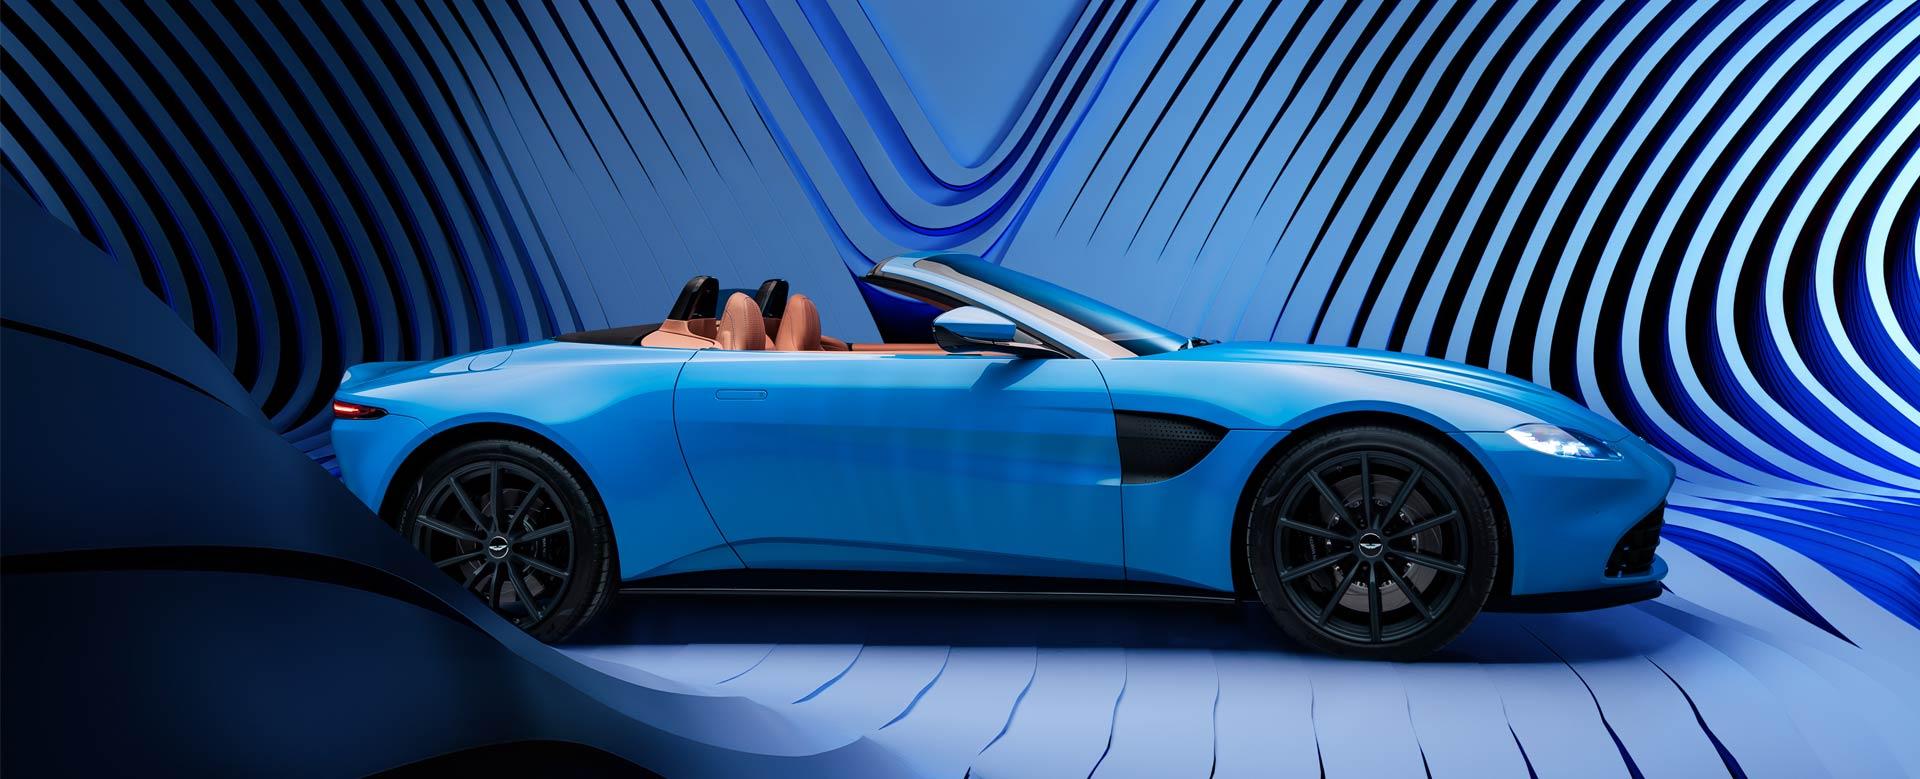 Vantage Roadster at Galpin Aston Martin